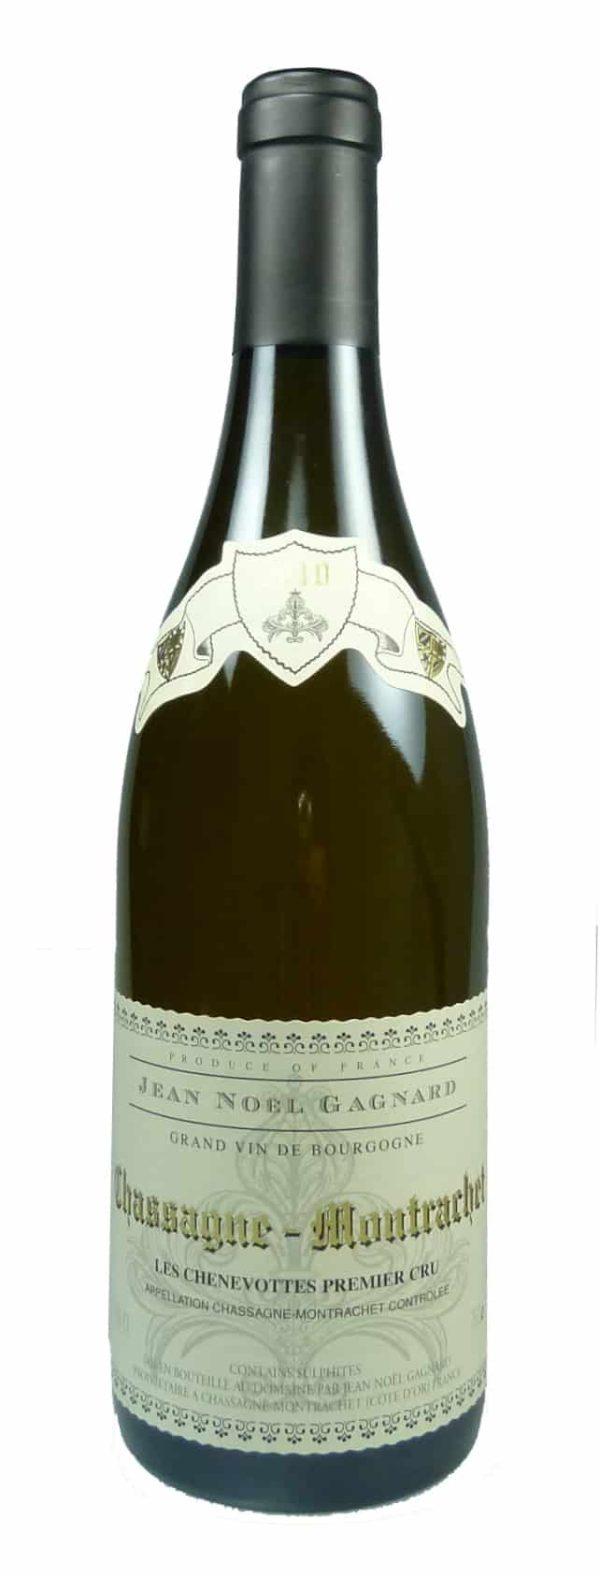 Chassagne-Montrachet Premier Cru Les Chenevottes 2015